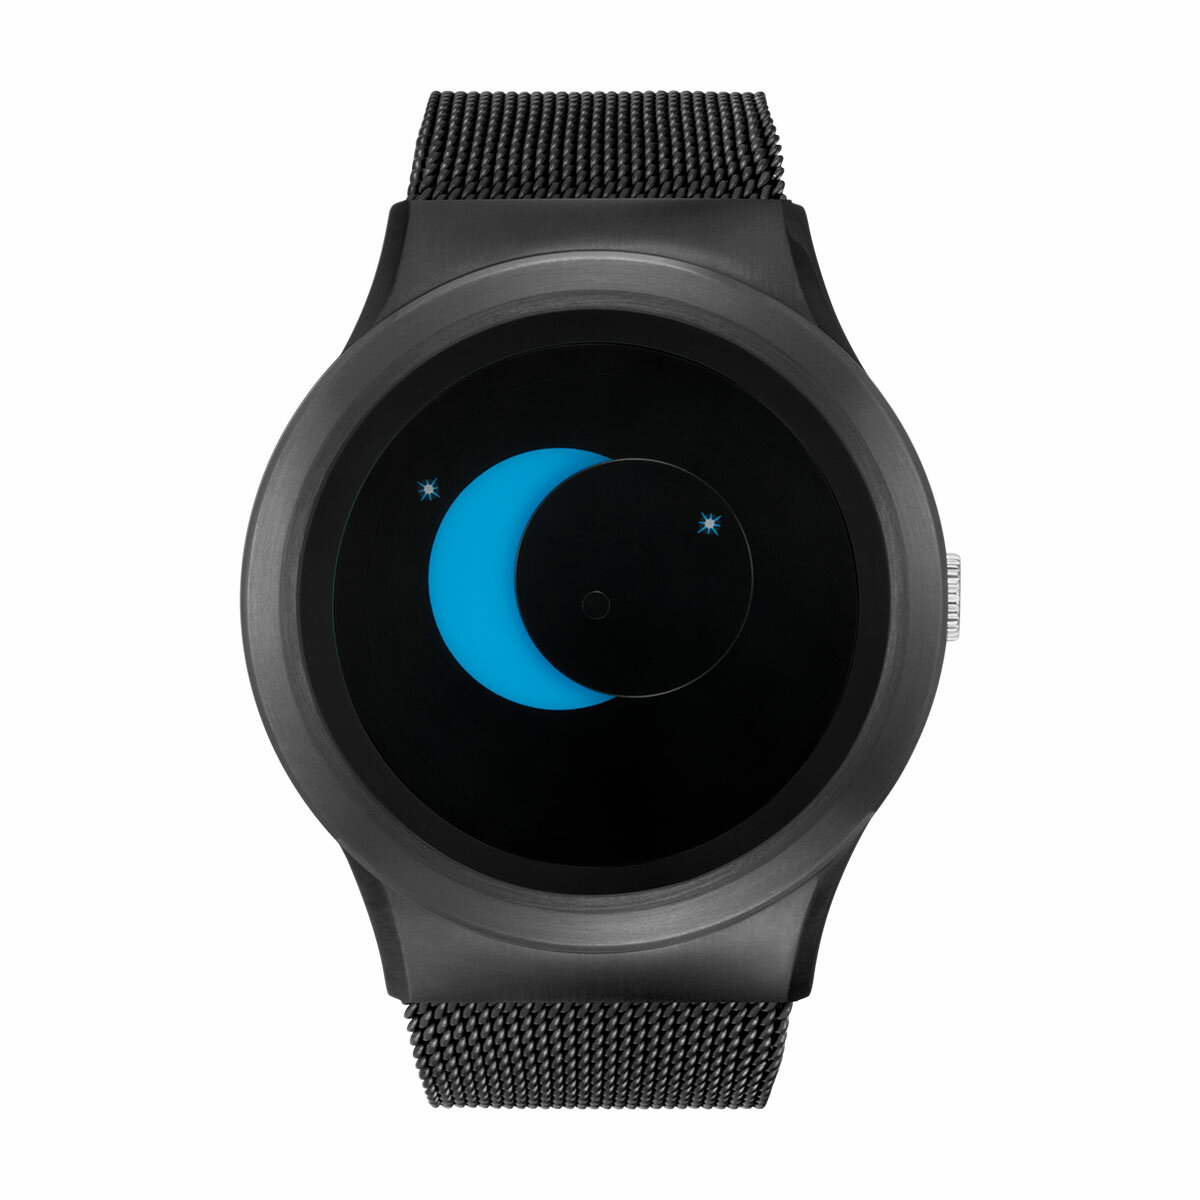 ZEROO SUPER MOON ゼロ 電池式クォーツ 腕時計 [W02006B03SM03] ブルー デザインウォッチ ペア用 メンズ レディース ユニセックス おしゃれ時計 デザイナーズ